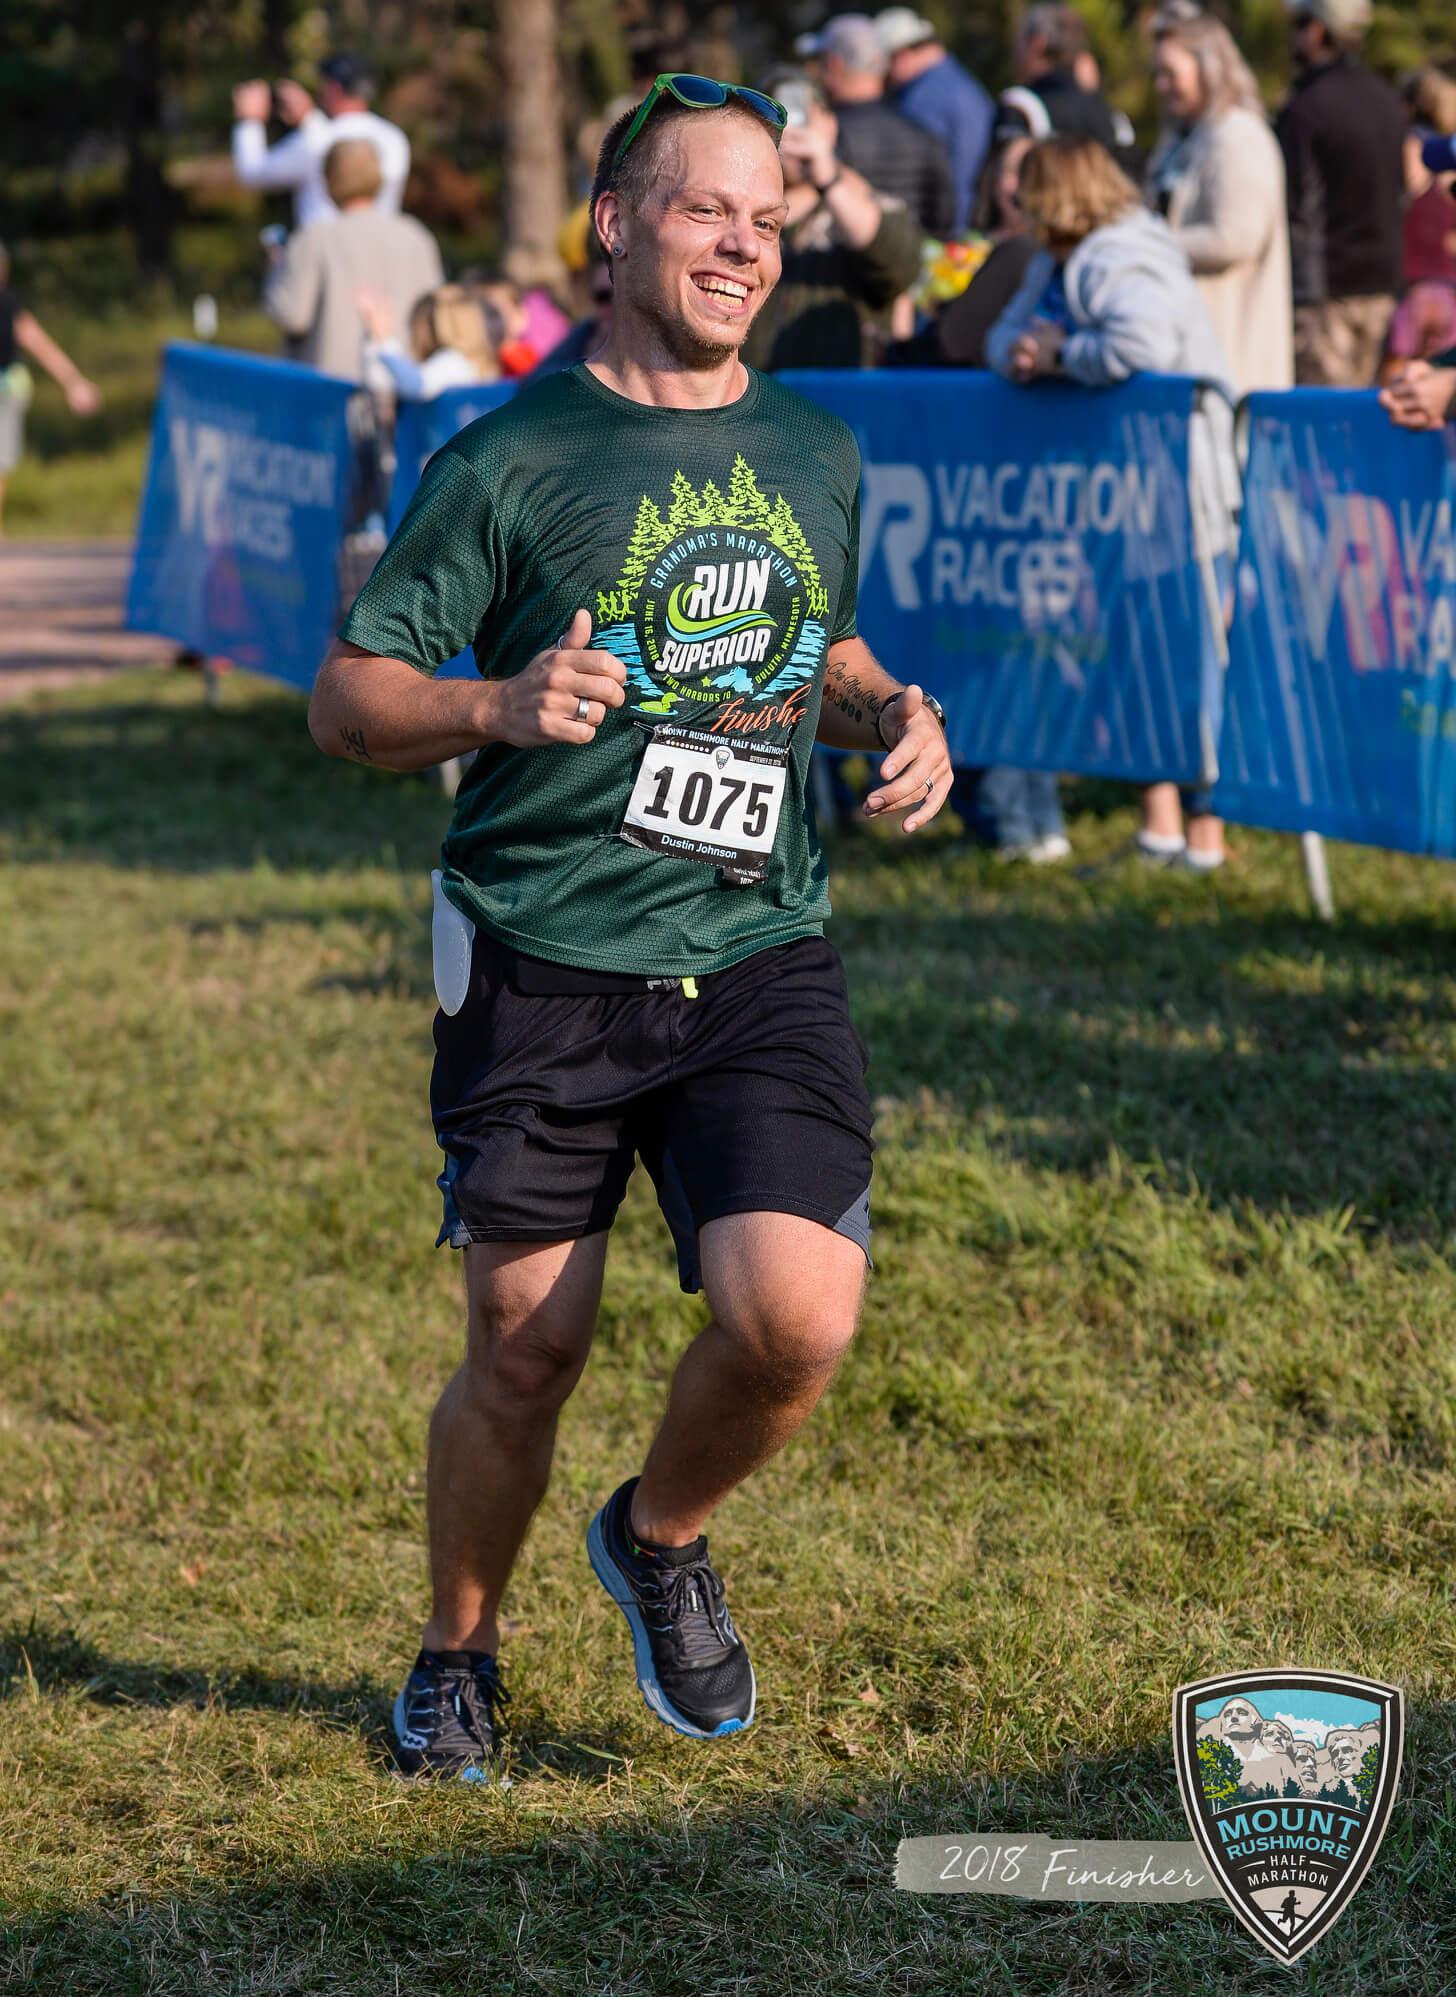 iFIT member Dustin Johnson running